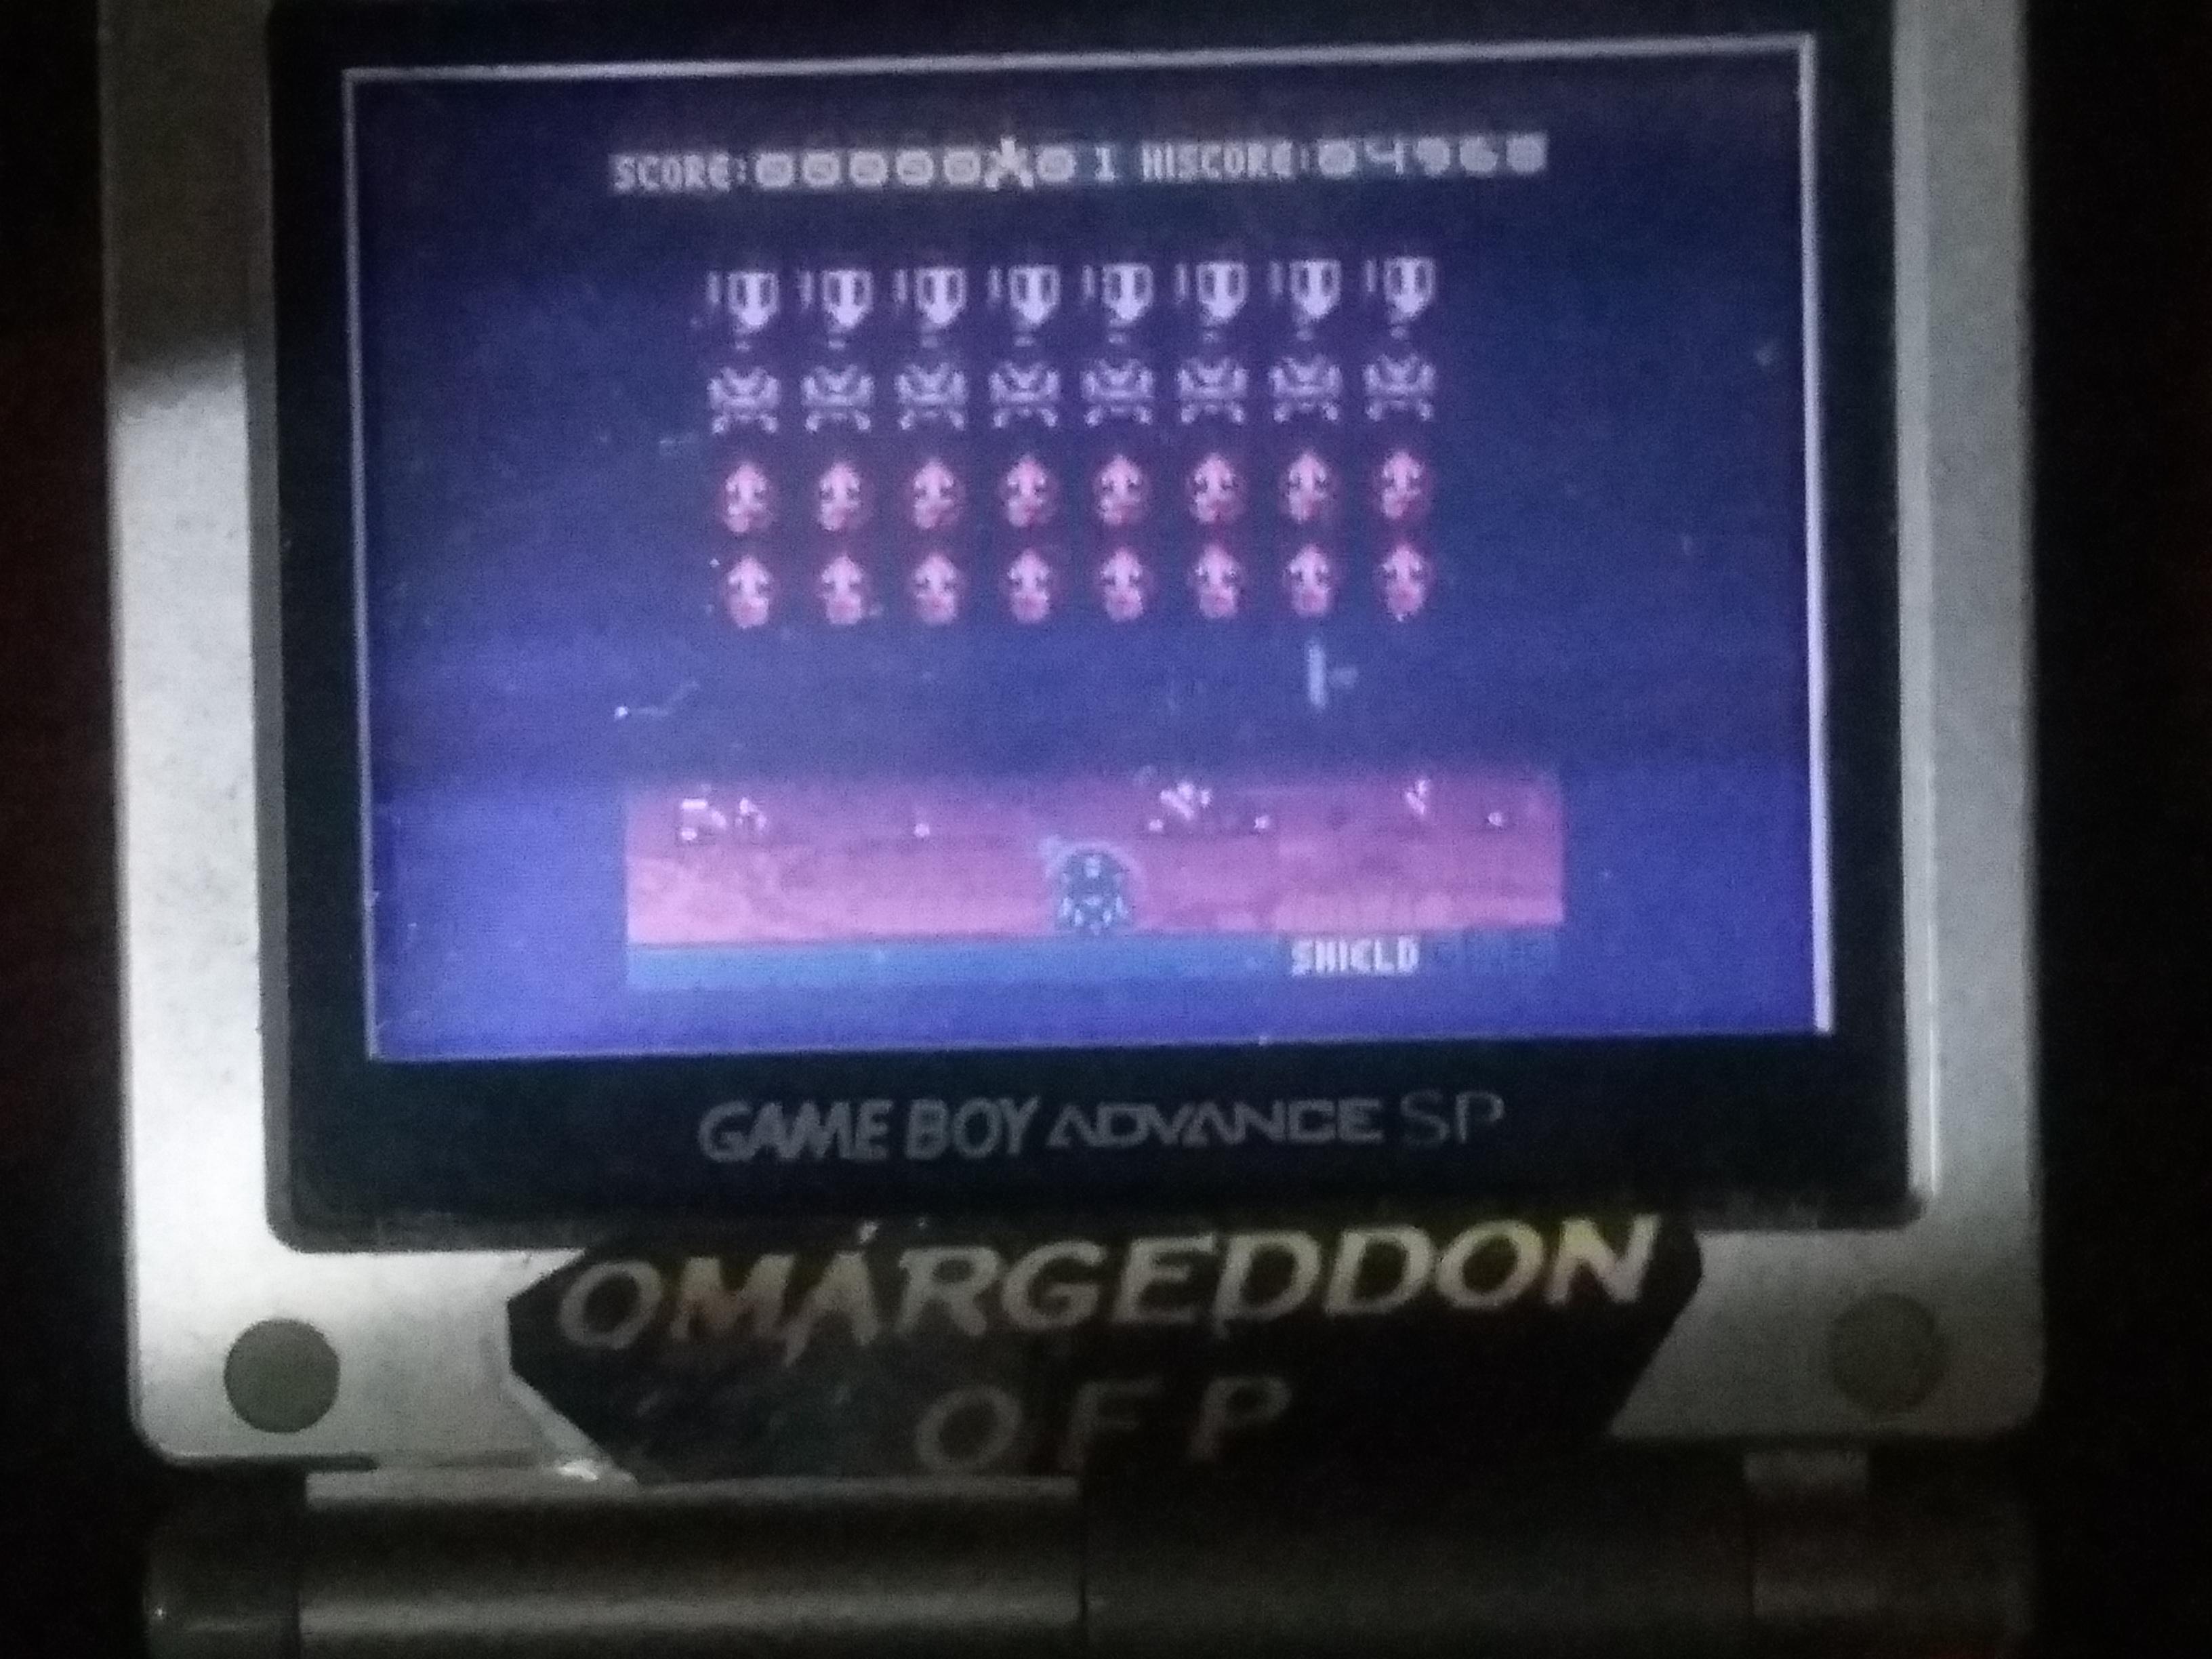 omargeddon: Space Invaders [Hard] (Game Boy Color) 4,968 points on 2018-02-28 20:05:18